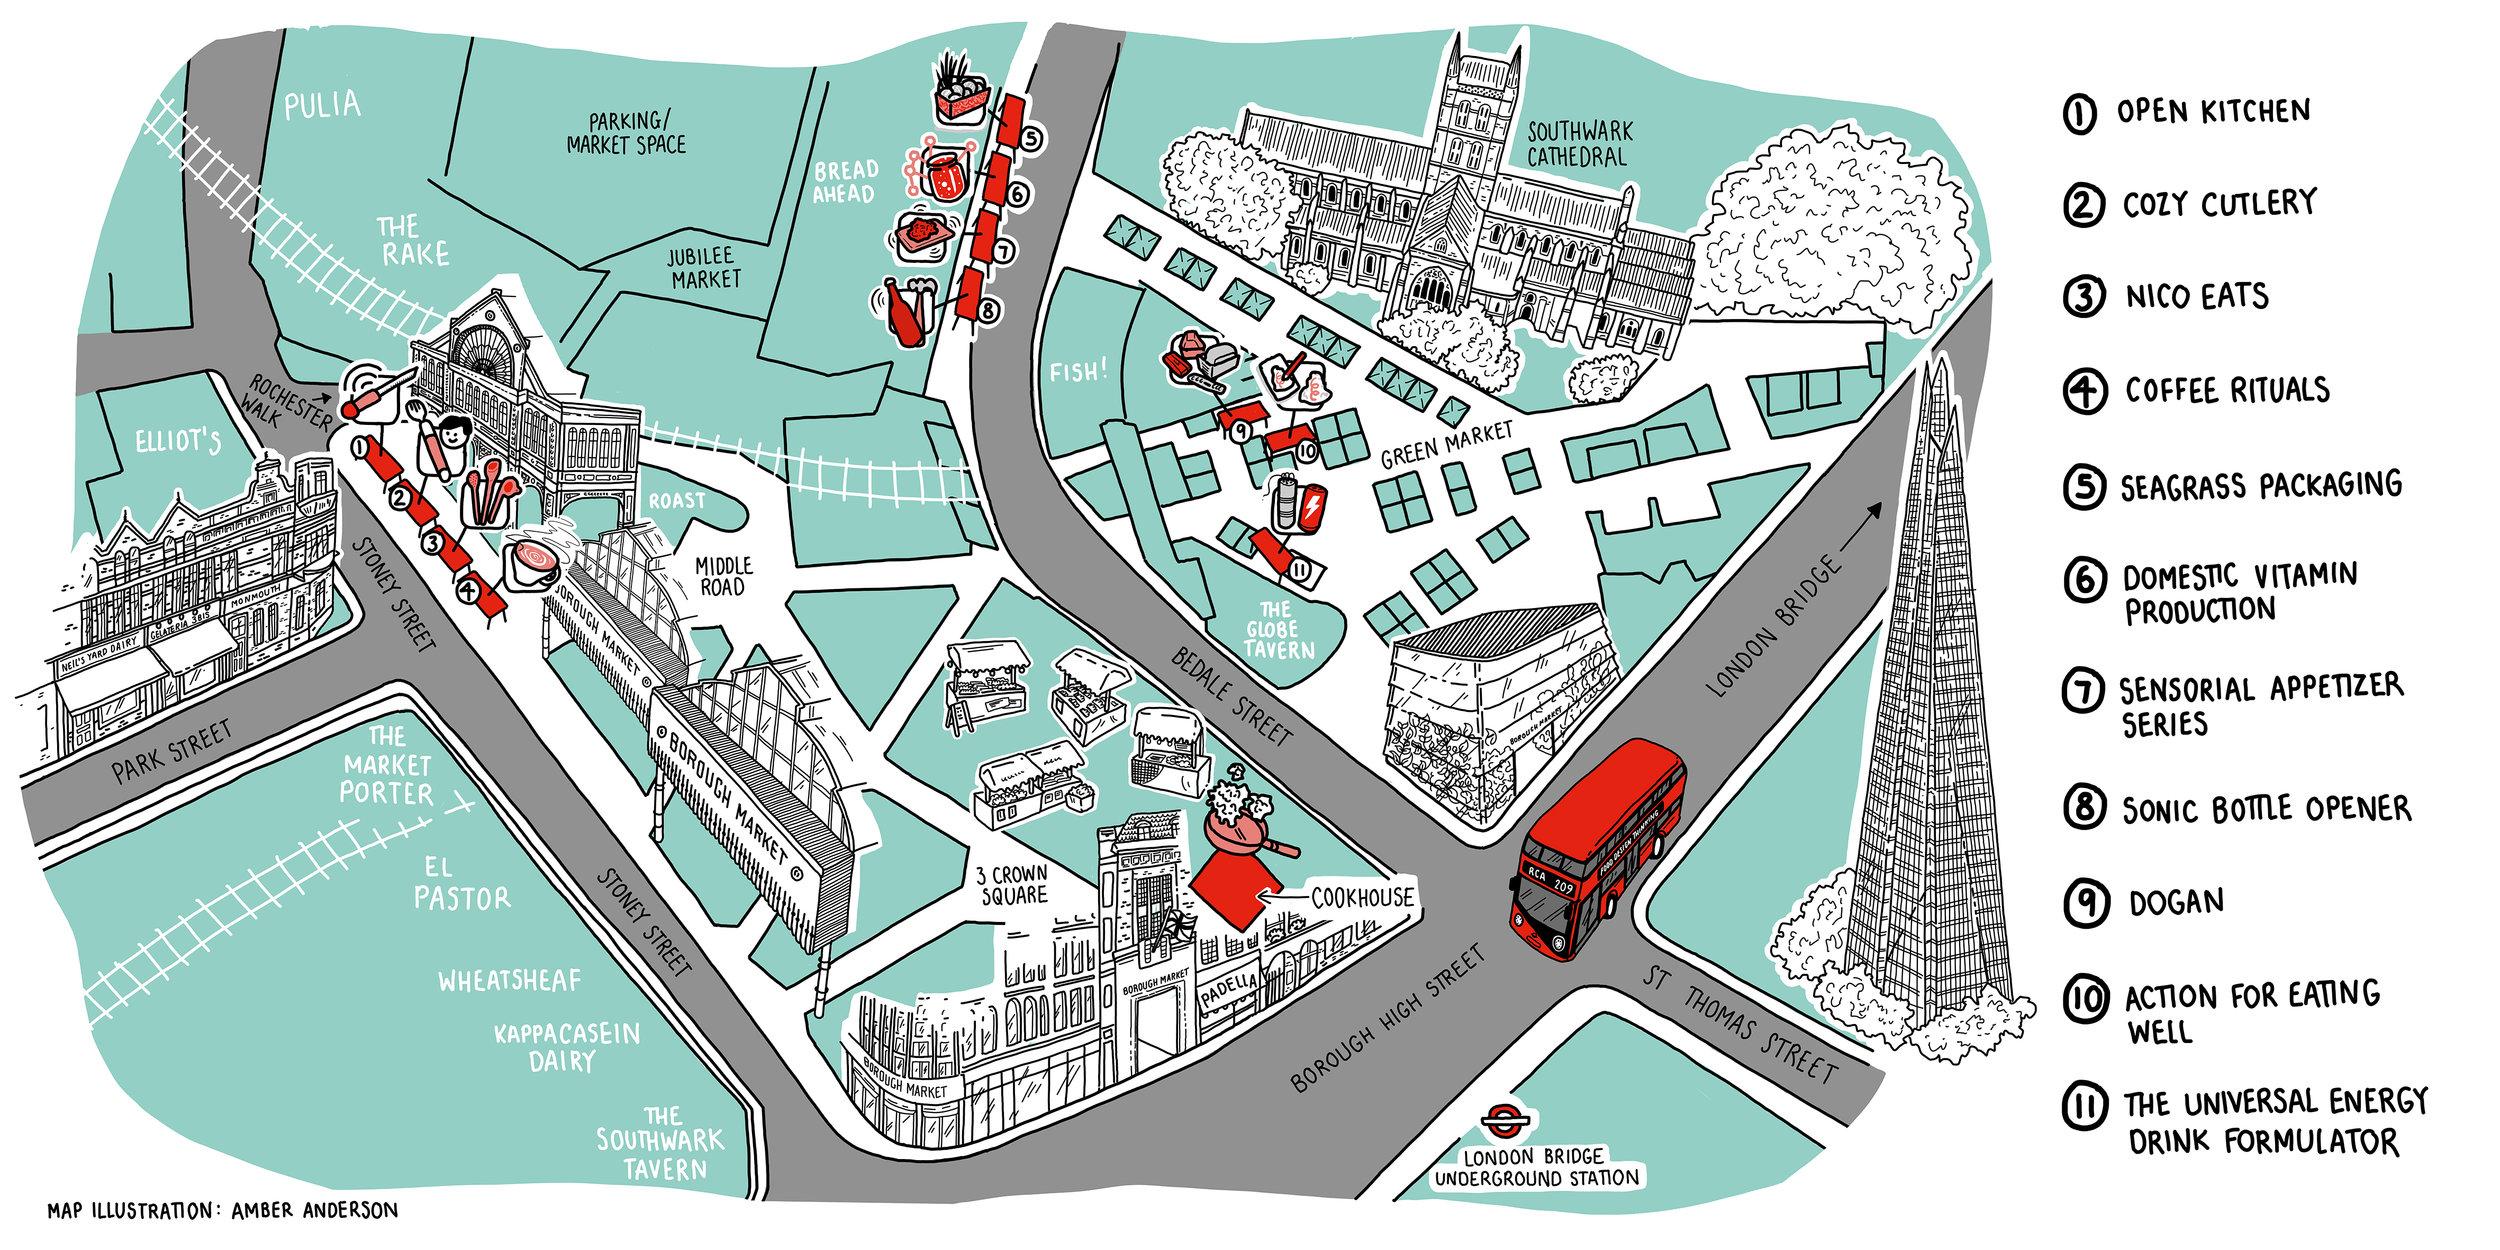 RCA_LDF_BoroughMarket_Map_v6_green_small.jpg